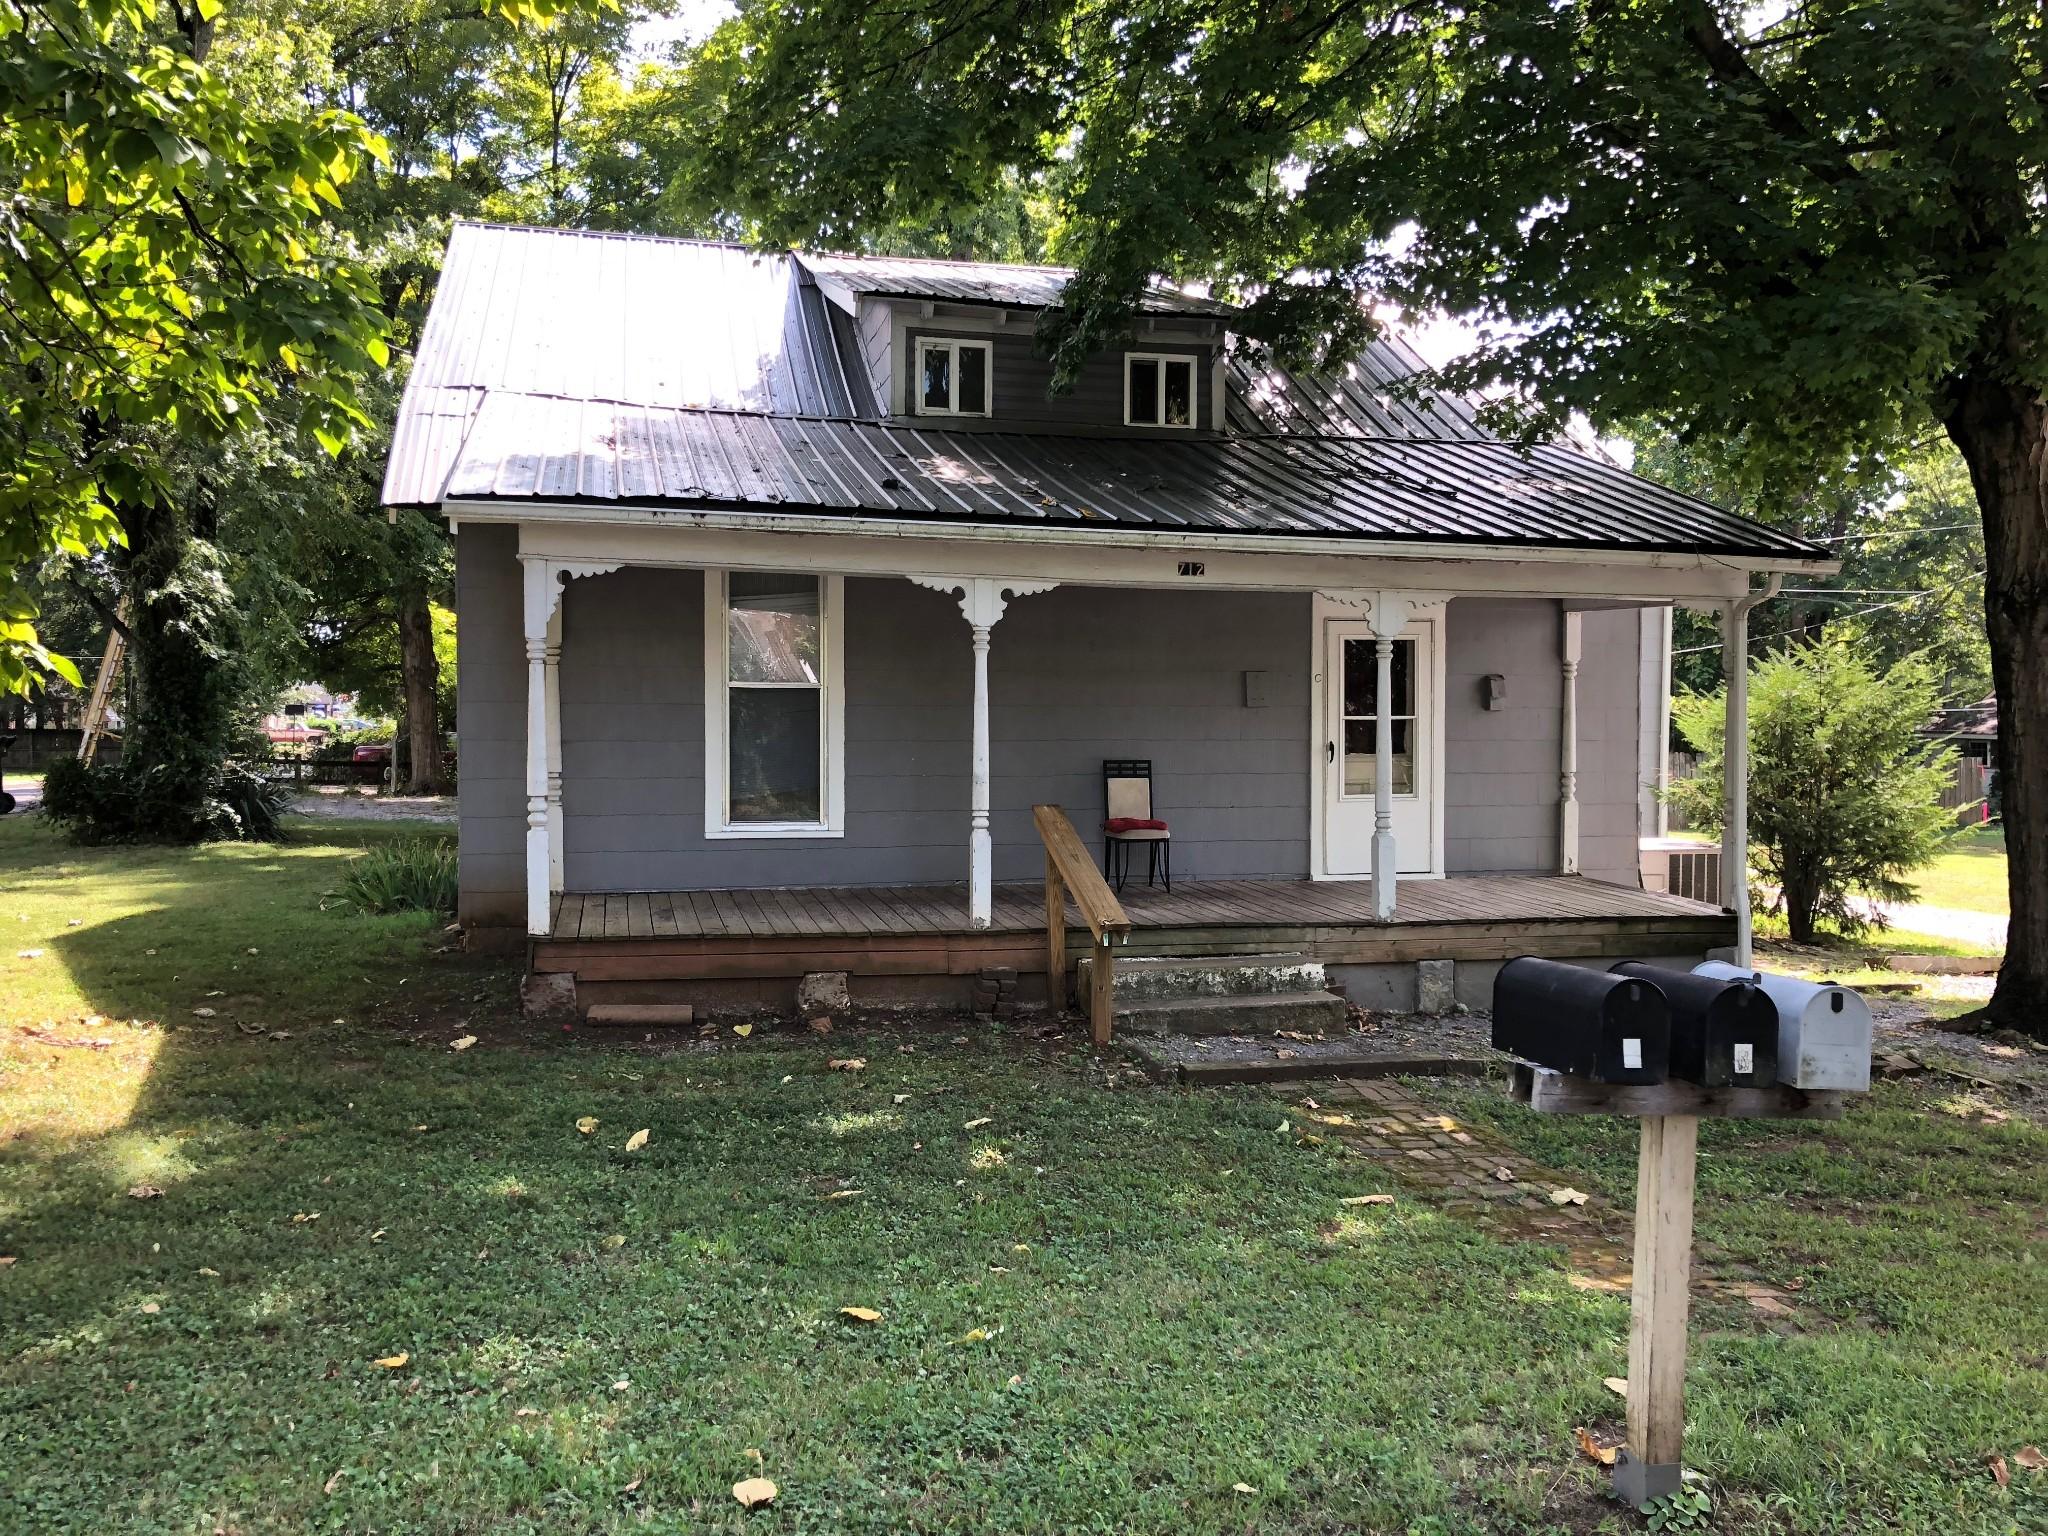 712 E Vine St #C Property Photo - Murfreesboro, TN real estate listing